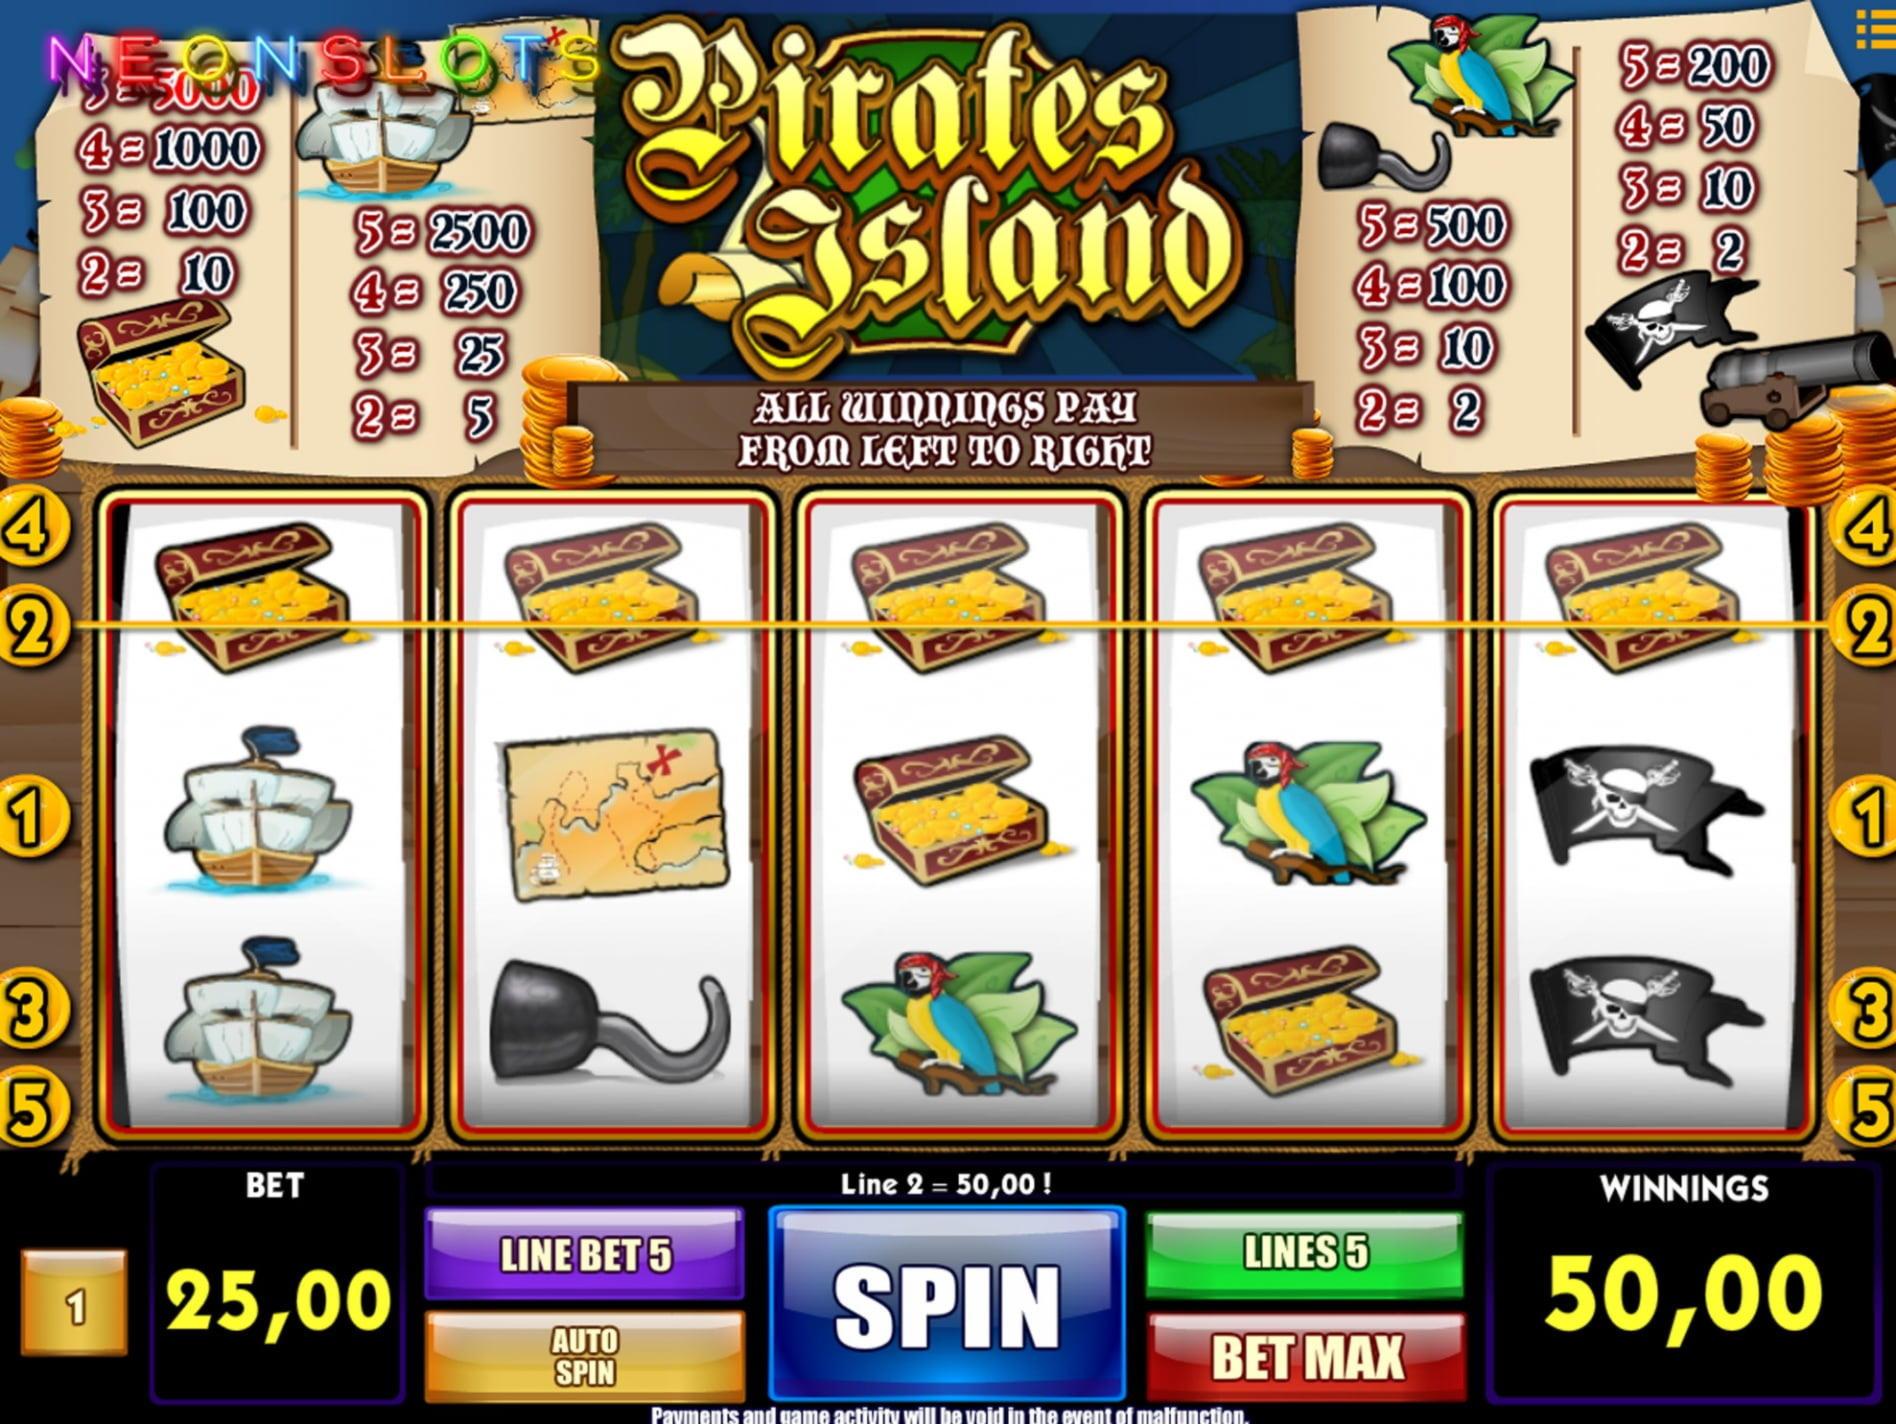 615% Deposit match bonus at Grand Mondial Casino